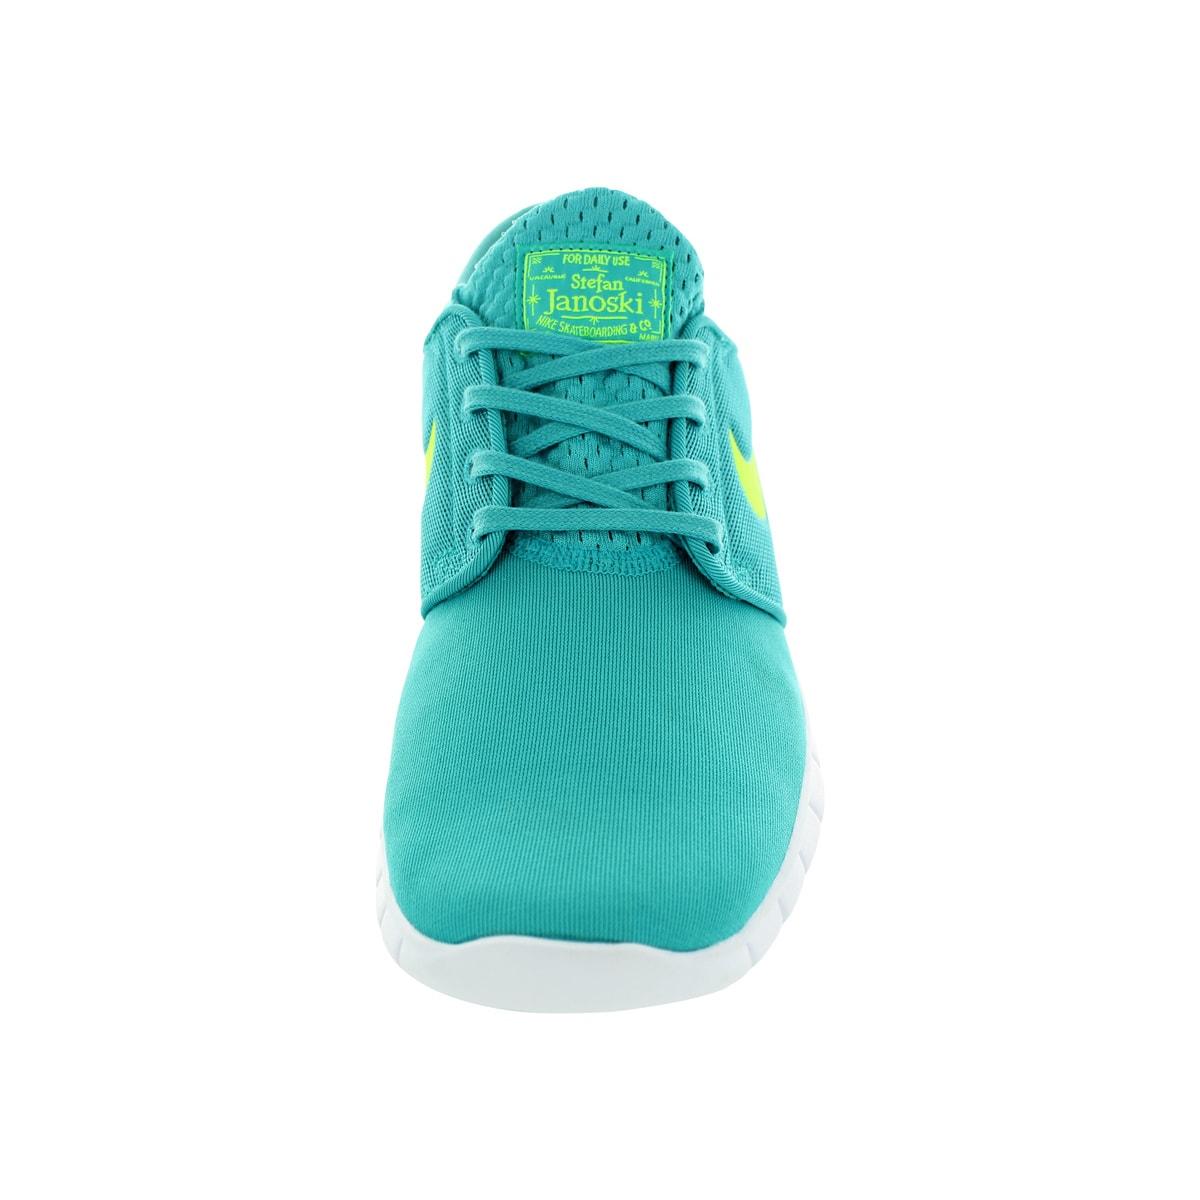 c56bc7c6f2e9 Shop Nike Men s Stefan Janoski Max Dusty Cactus Volt White Mesh Running Shoe  - Ships To Canada - Overstock - 12115385